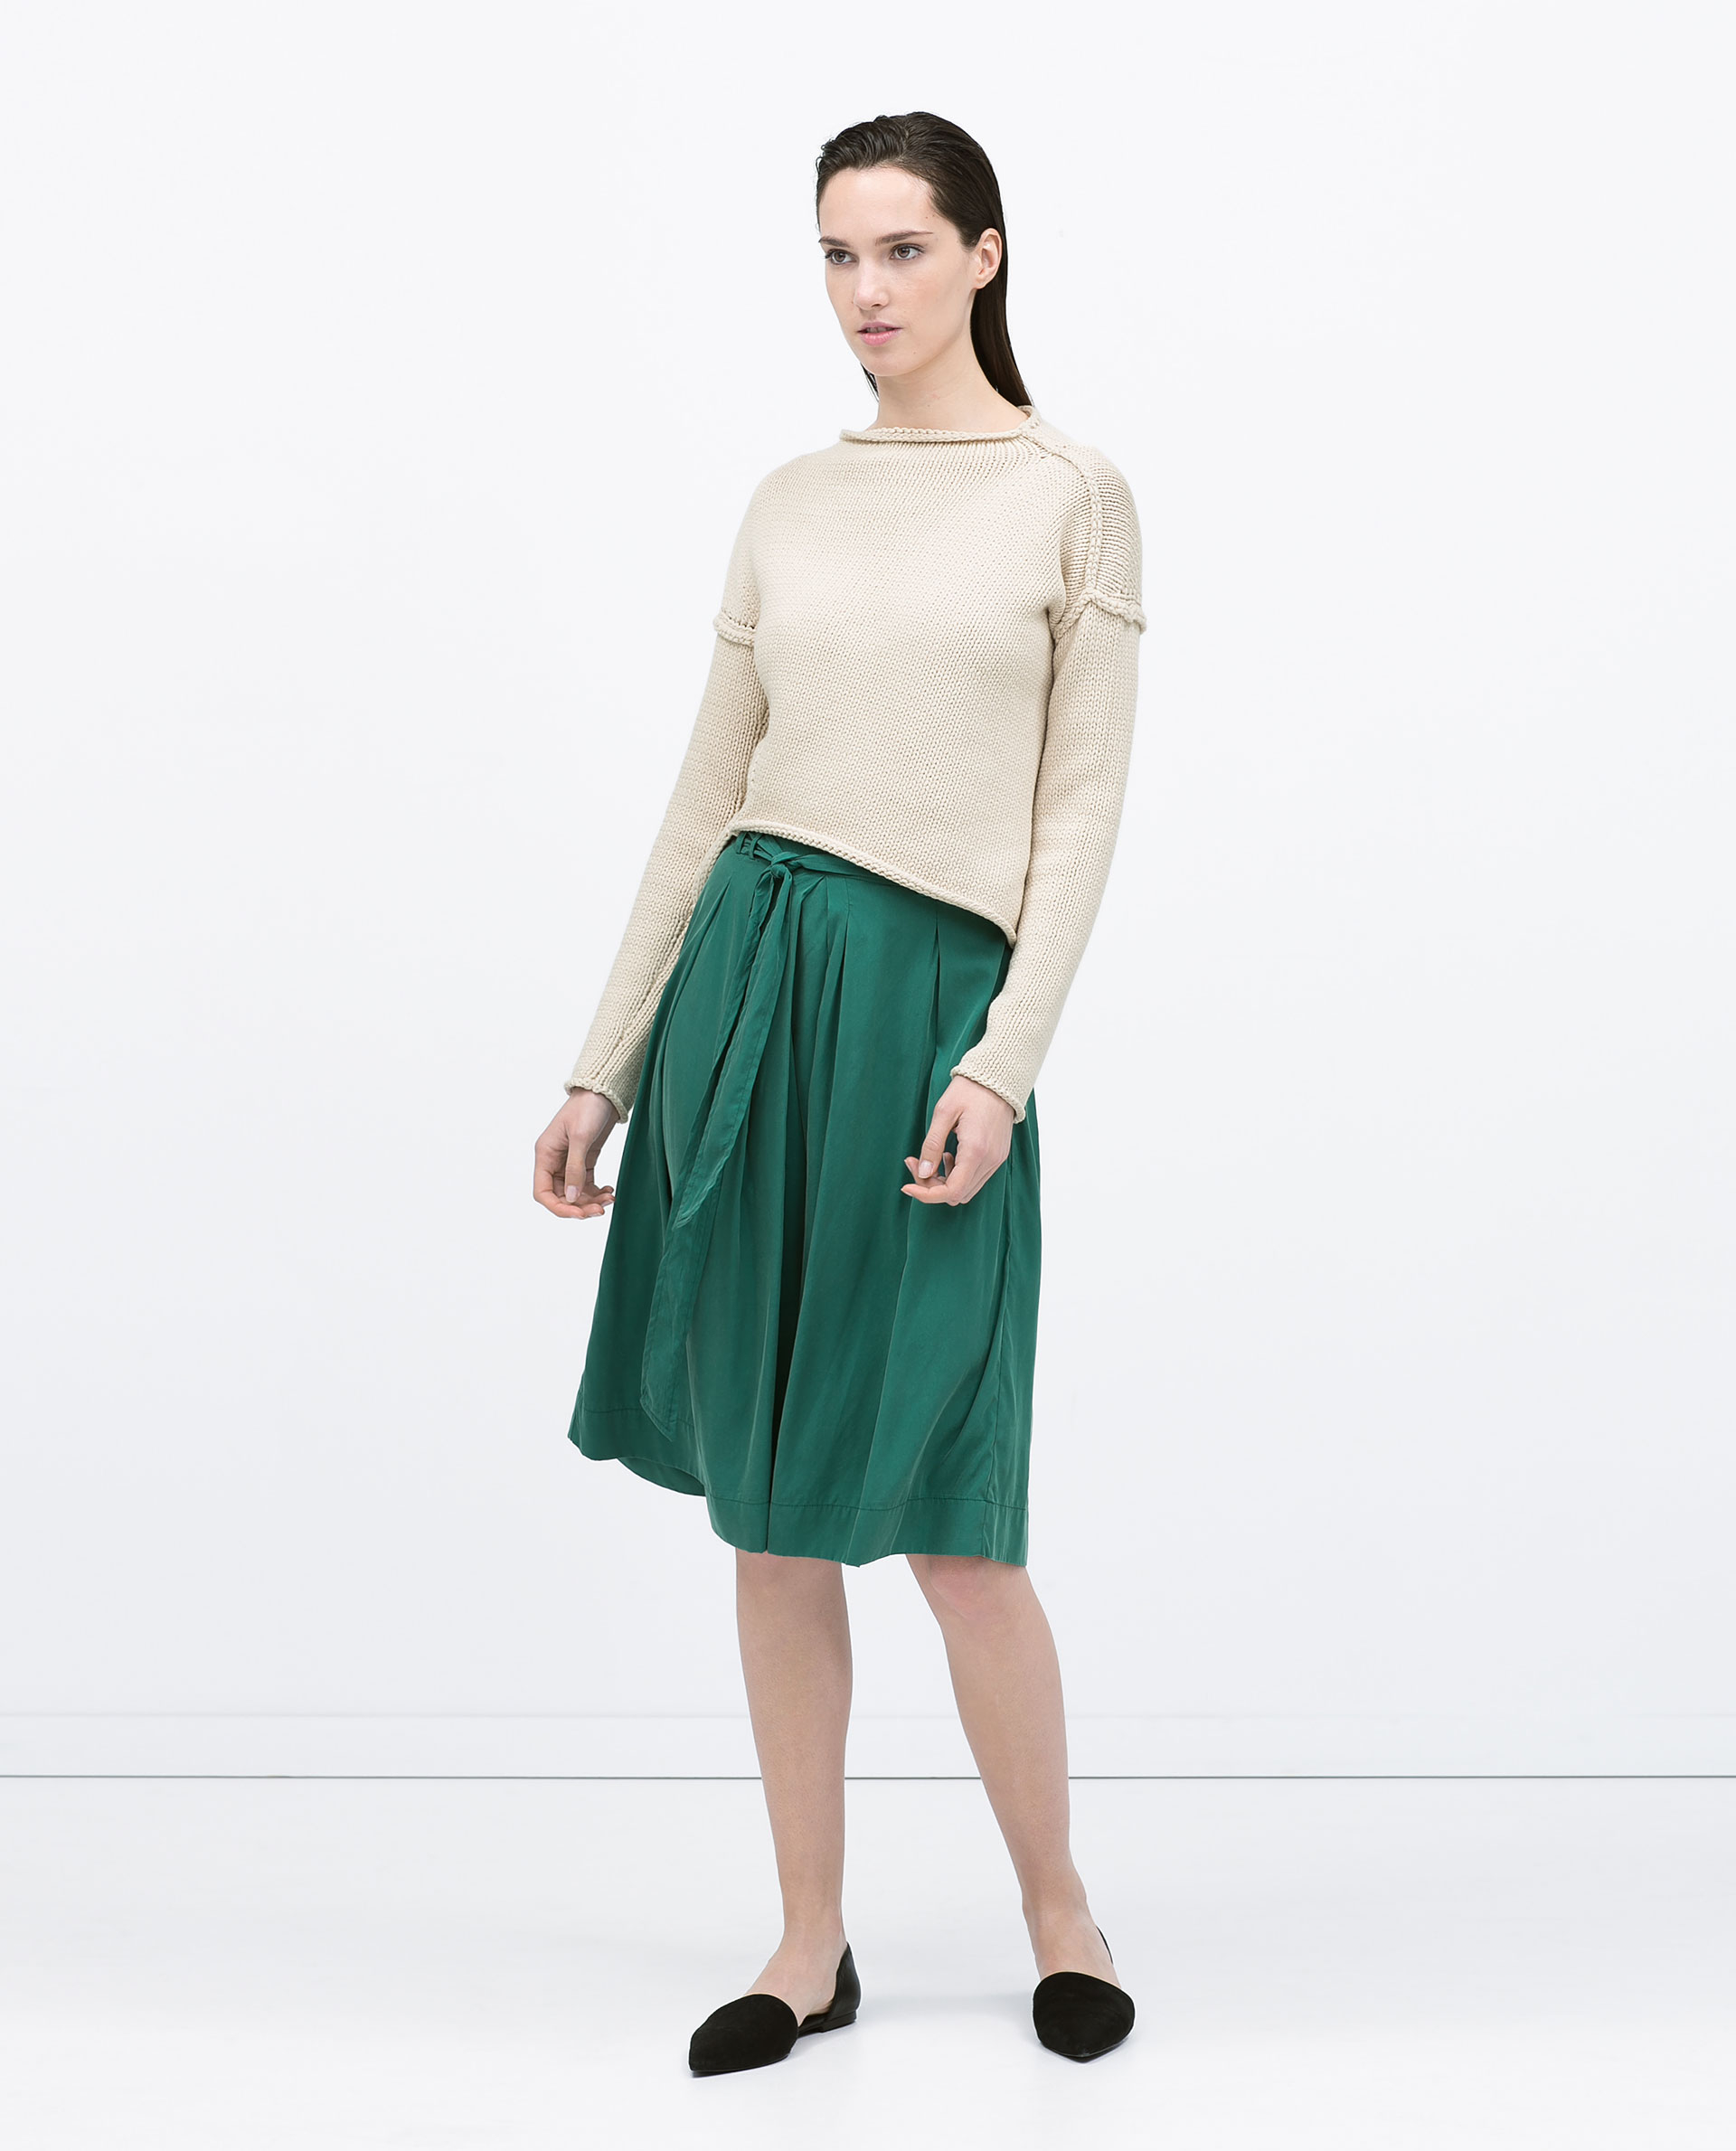 Zara Tie-Belt Midi Skirt Tie-Belt Midi Skirt in Green | Lyst